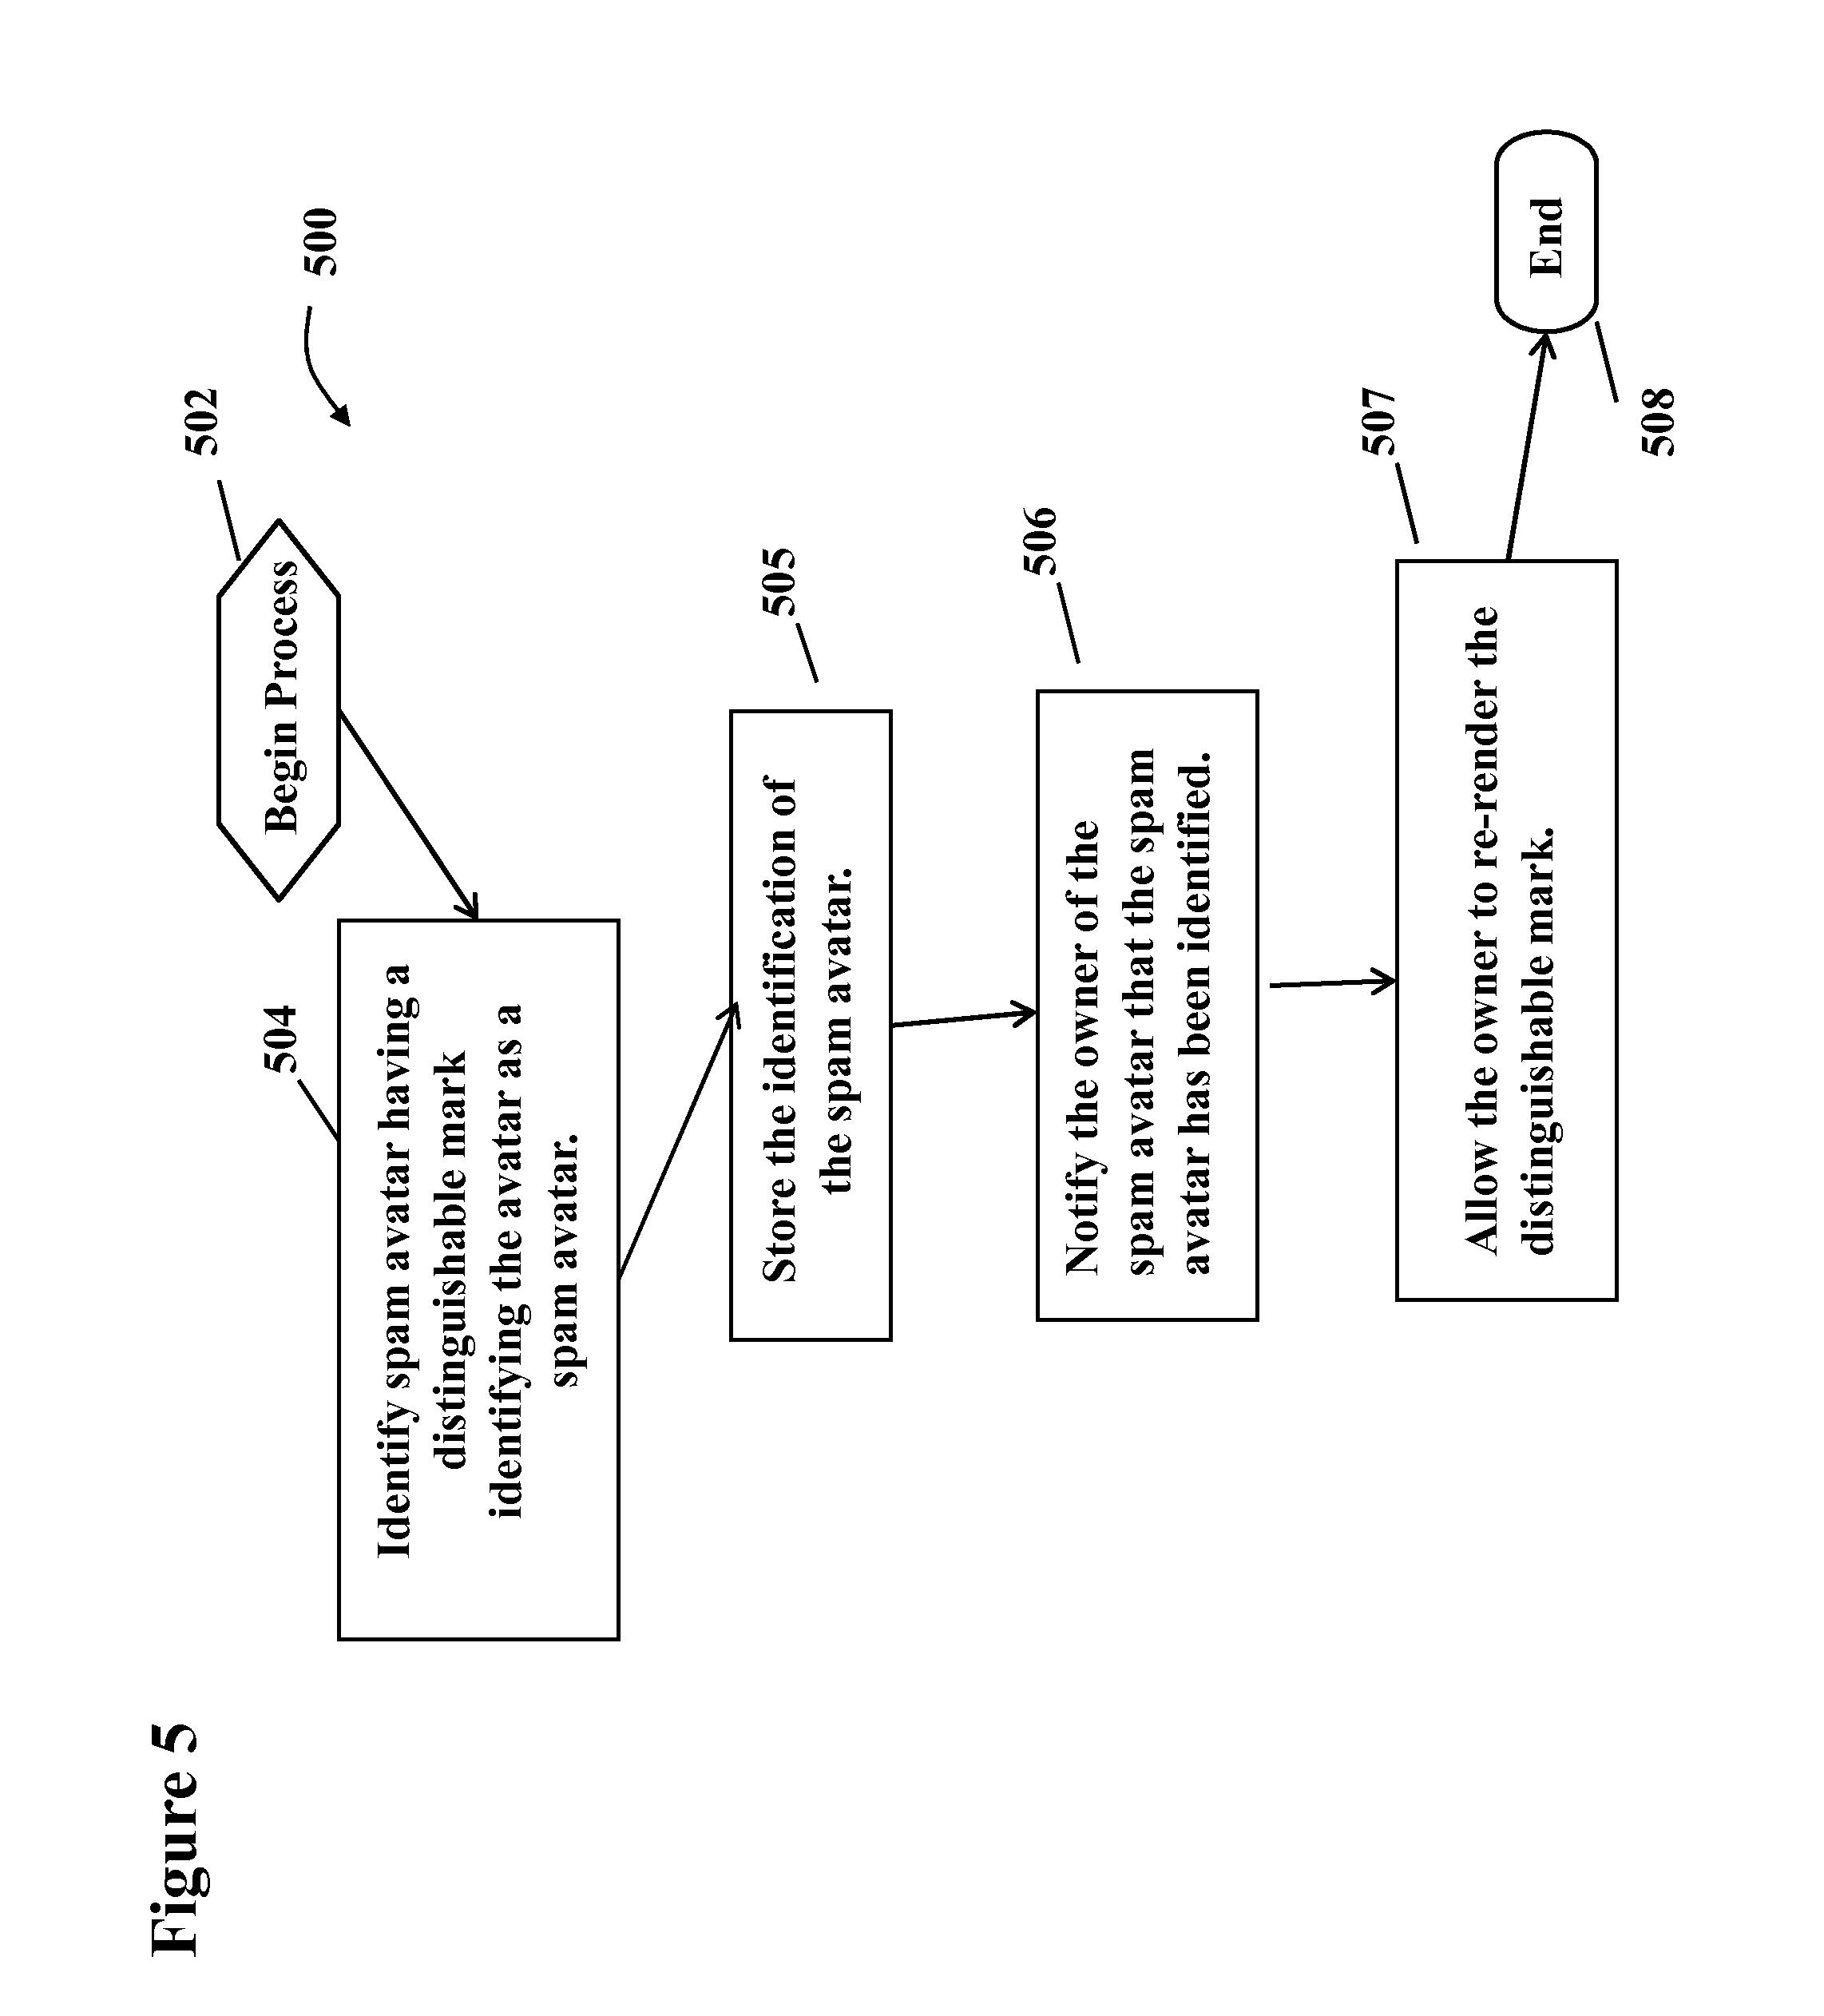 Patent US8656476 - Providing notification of spam avatars - Google